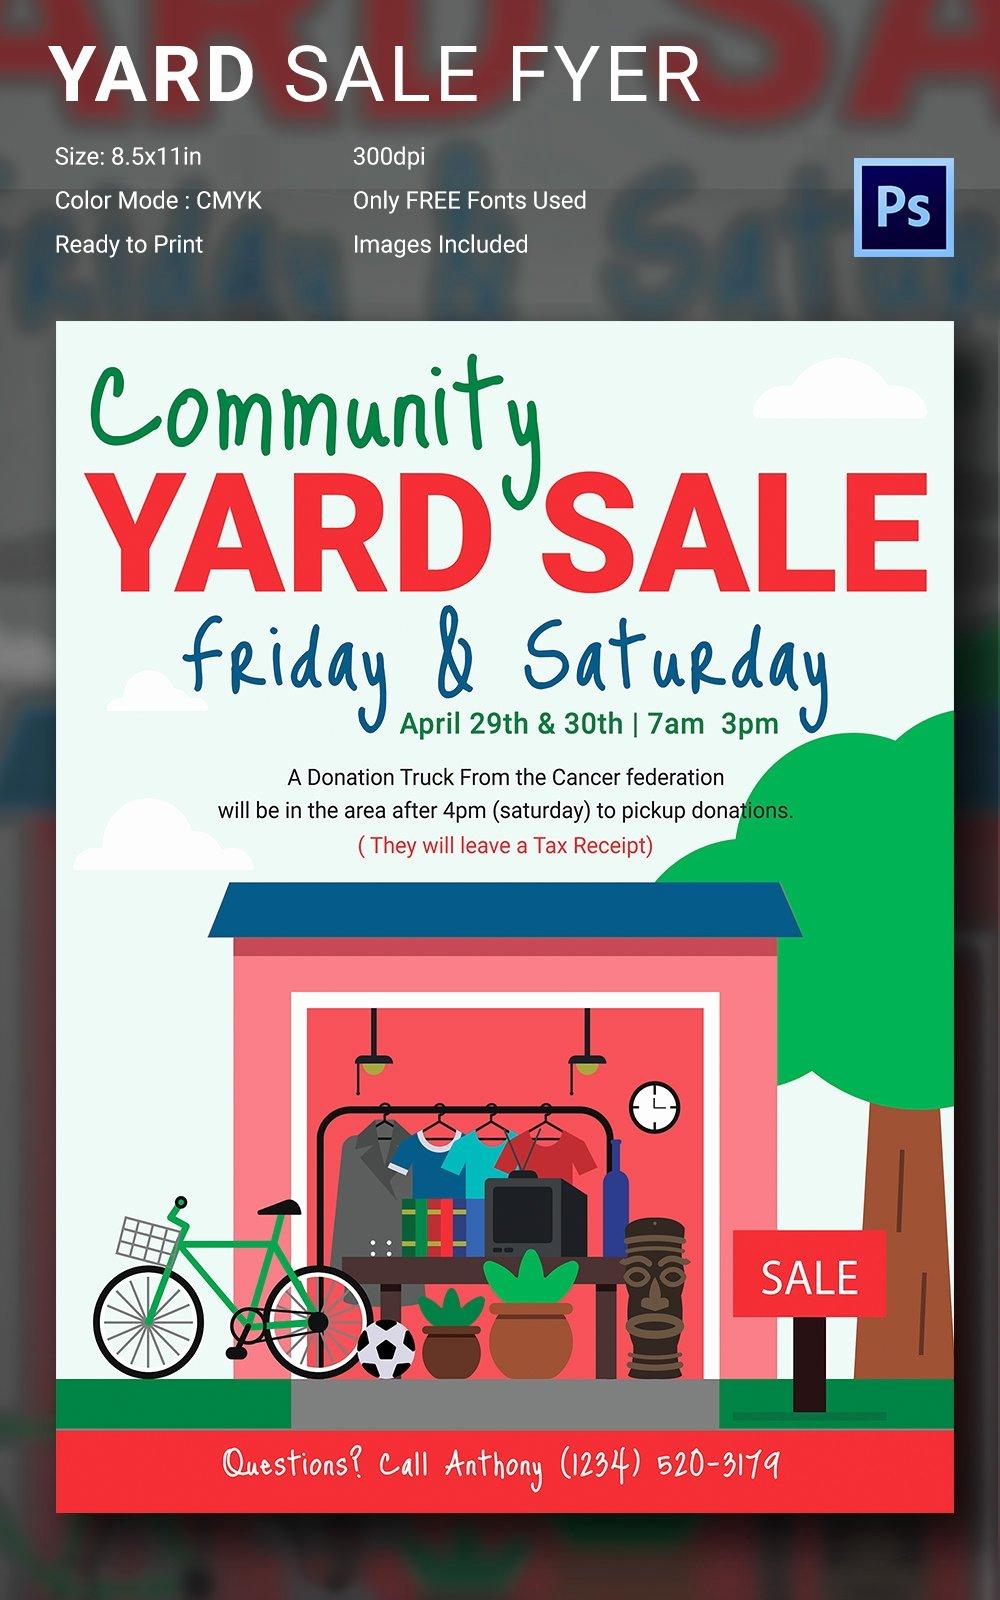 Garage Sale Flyer Template Free Inspirational 14 Best Yard Sale Flyer Templates & Psd Designs